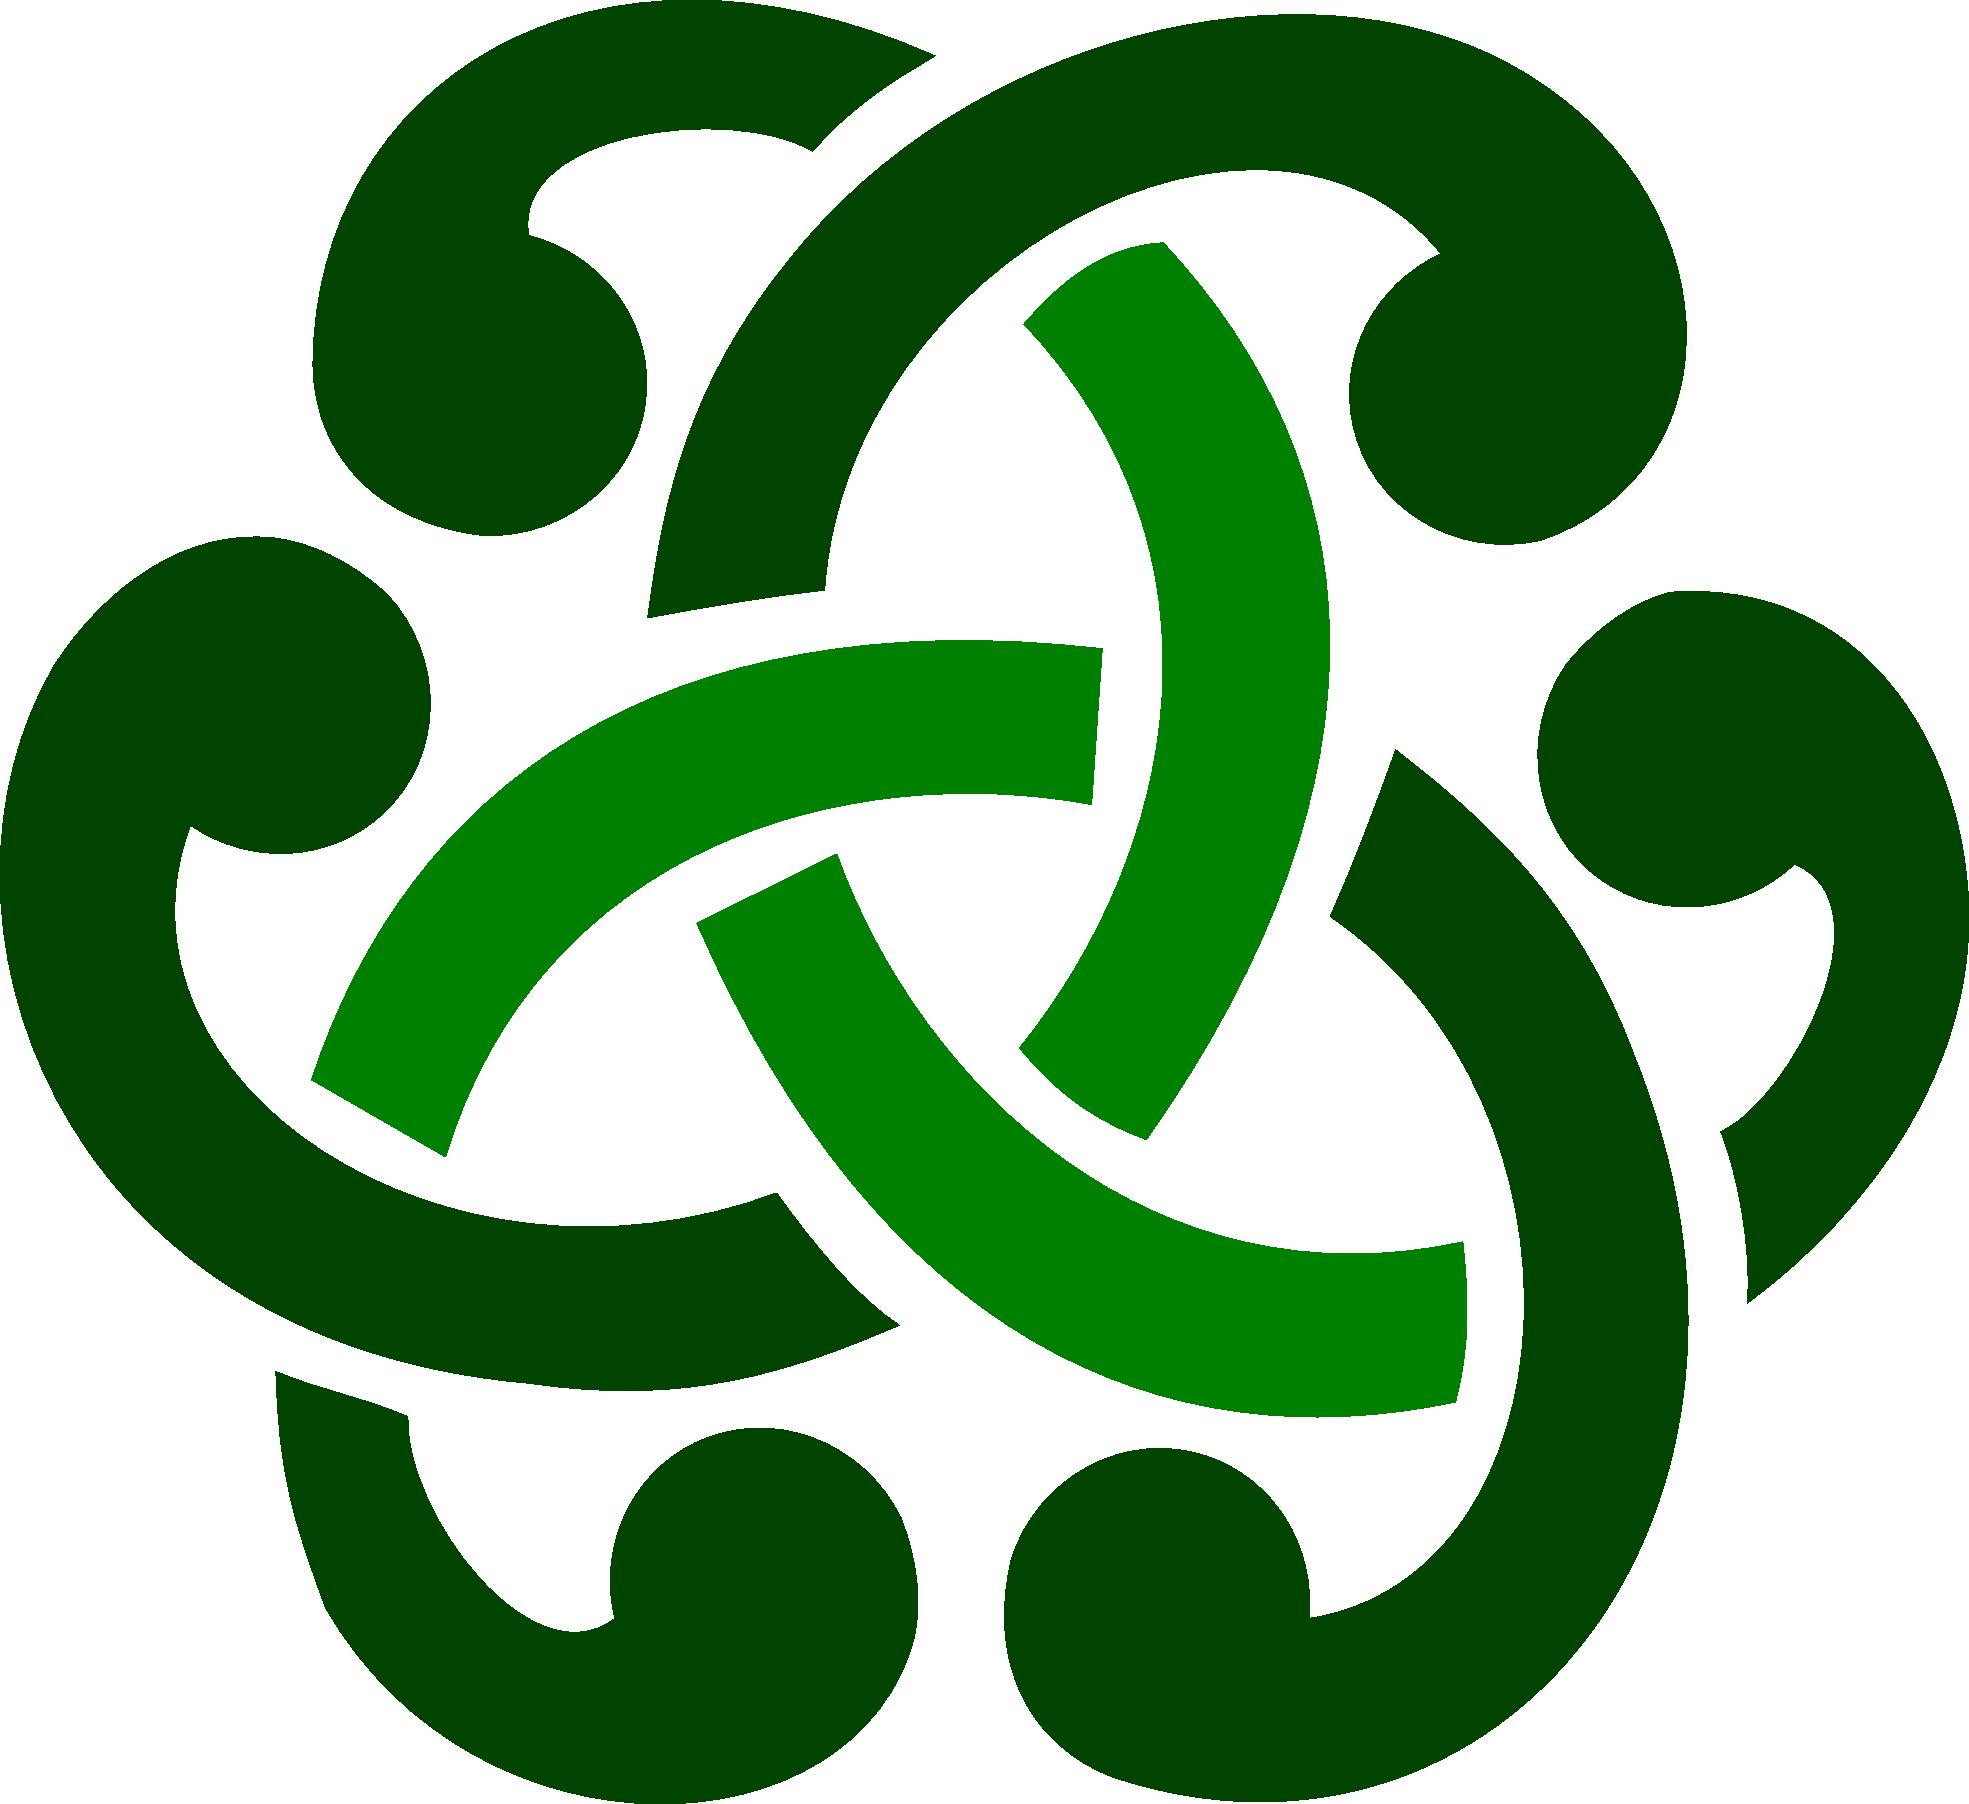 Celt clipart family Celtic  symbol symbol Search